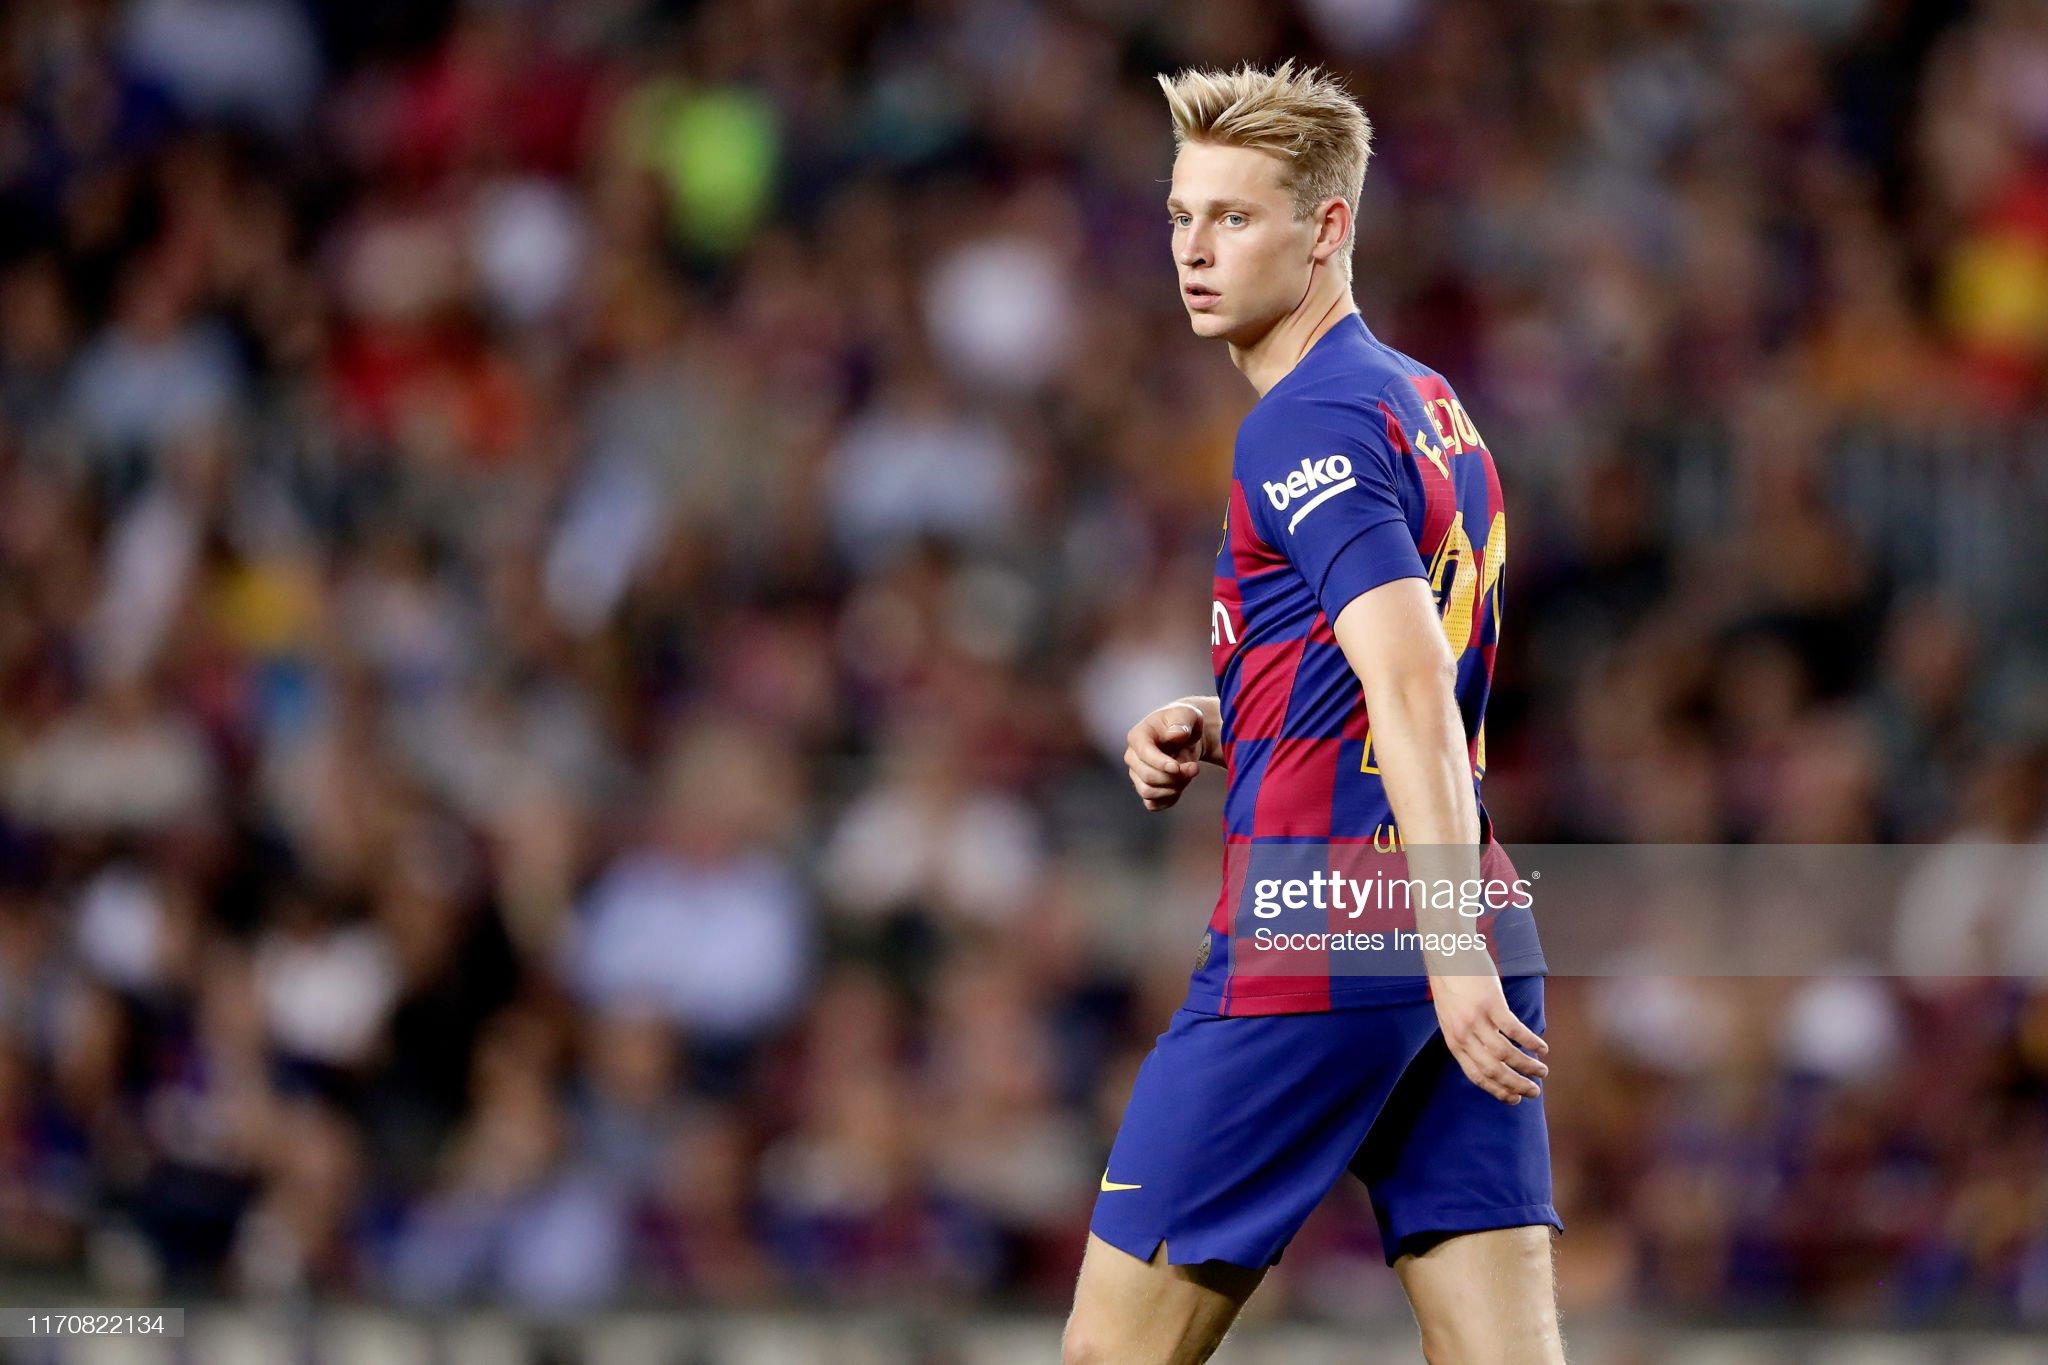 صور مباراة : برشلونة - فياريال 2-1 ( 24-09-2019 )  Frenkie-de-jong-of-fc-barcelona-during-the-la-liga-santander-match-picture-id1170822134?s=2048x2048